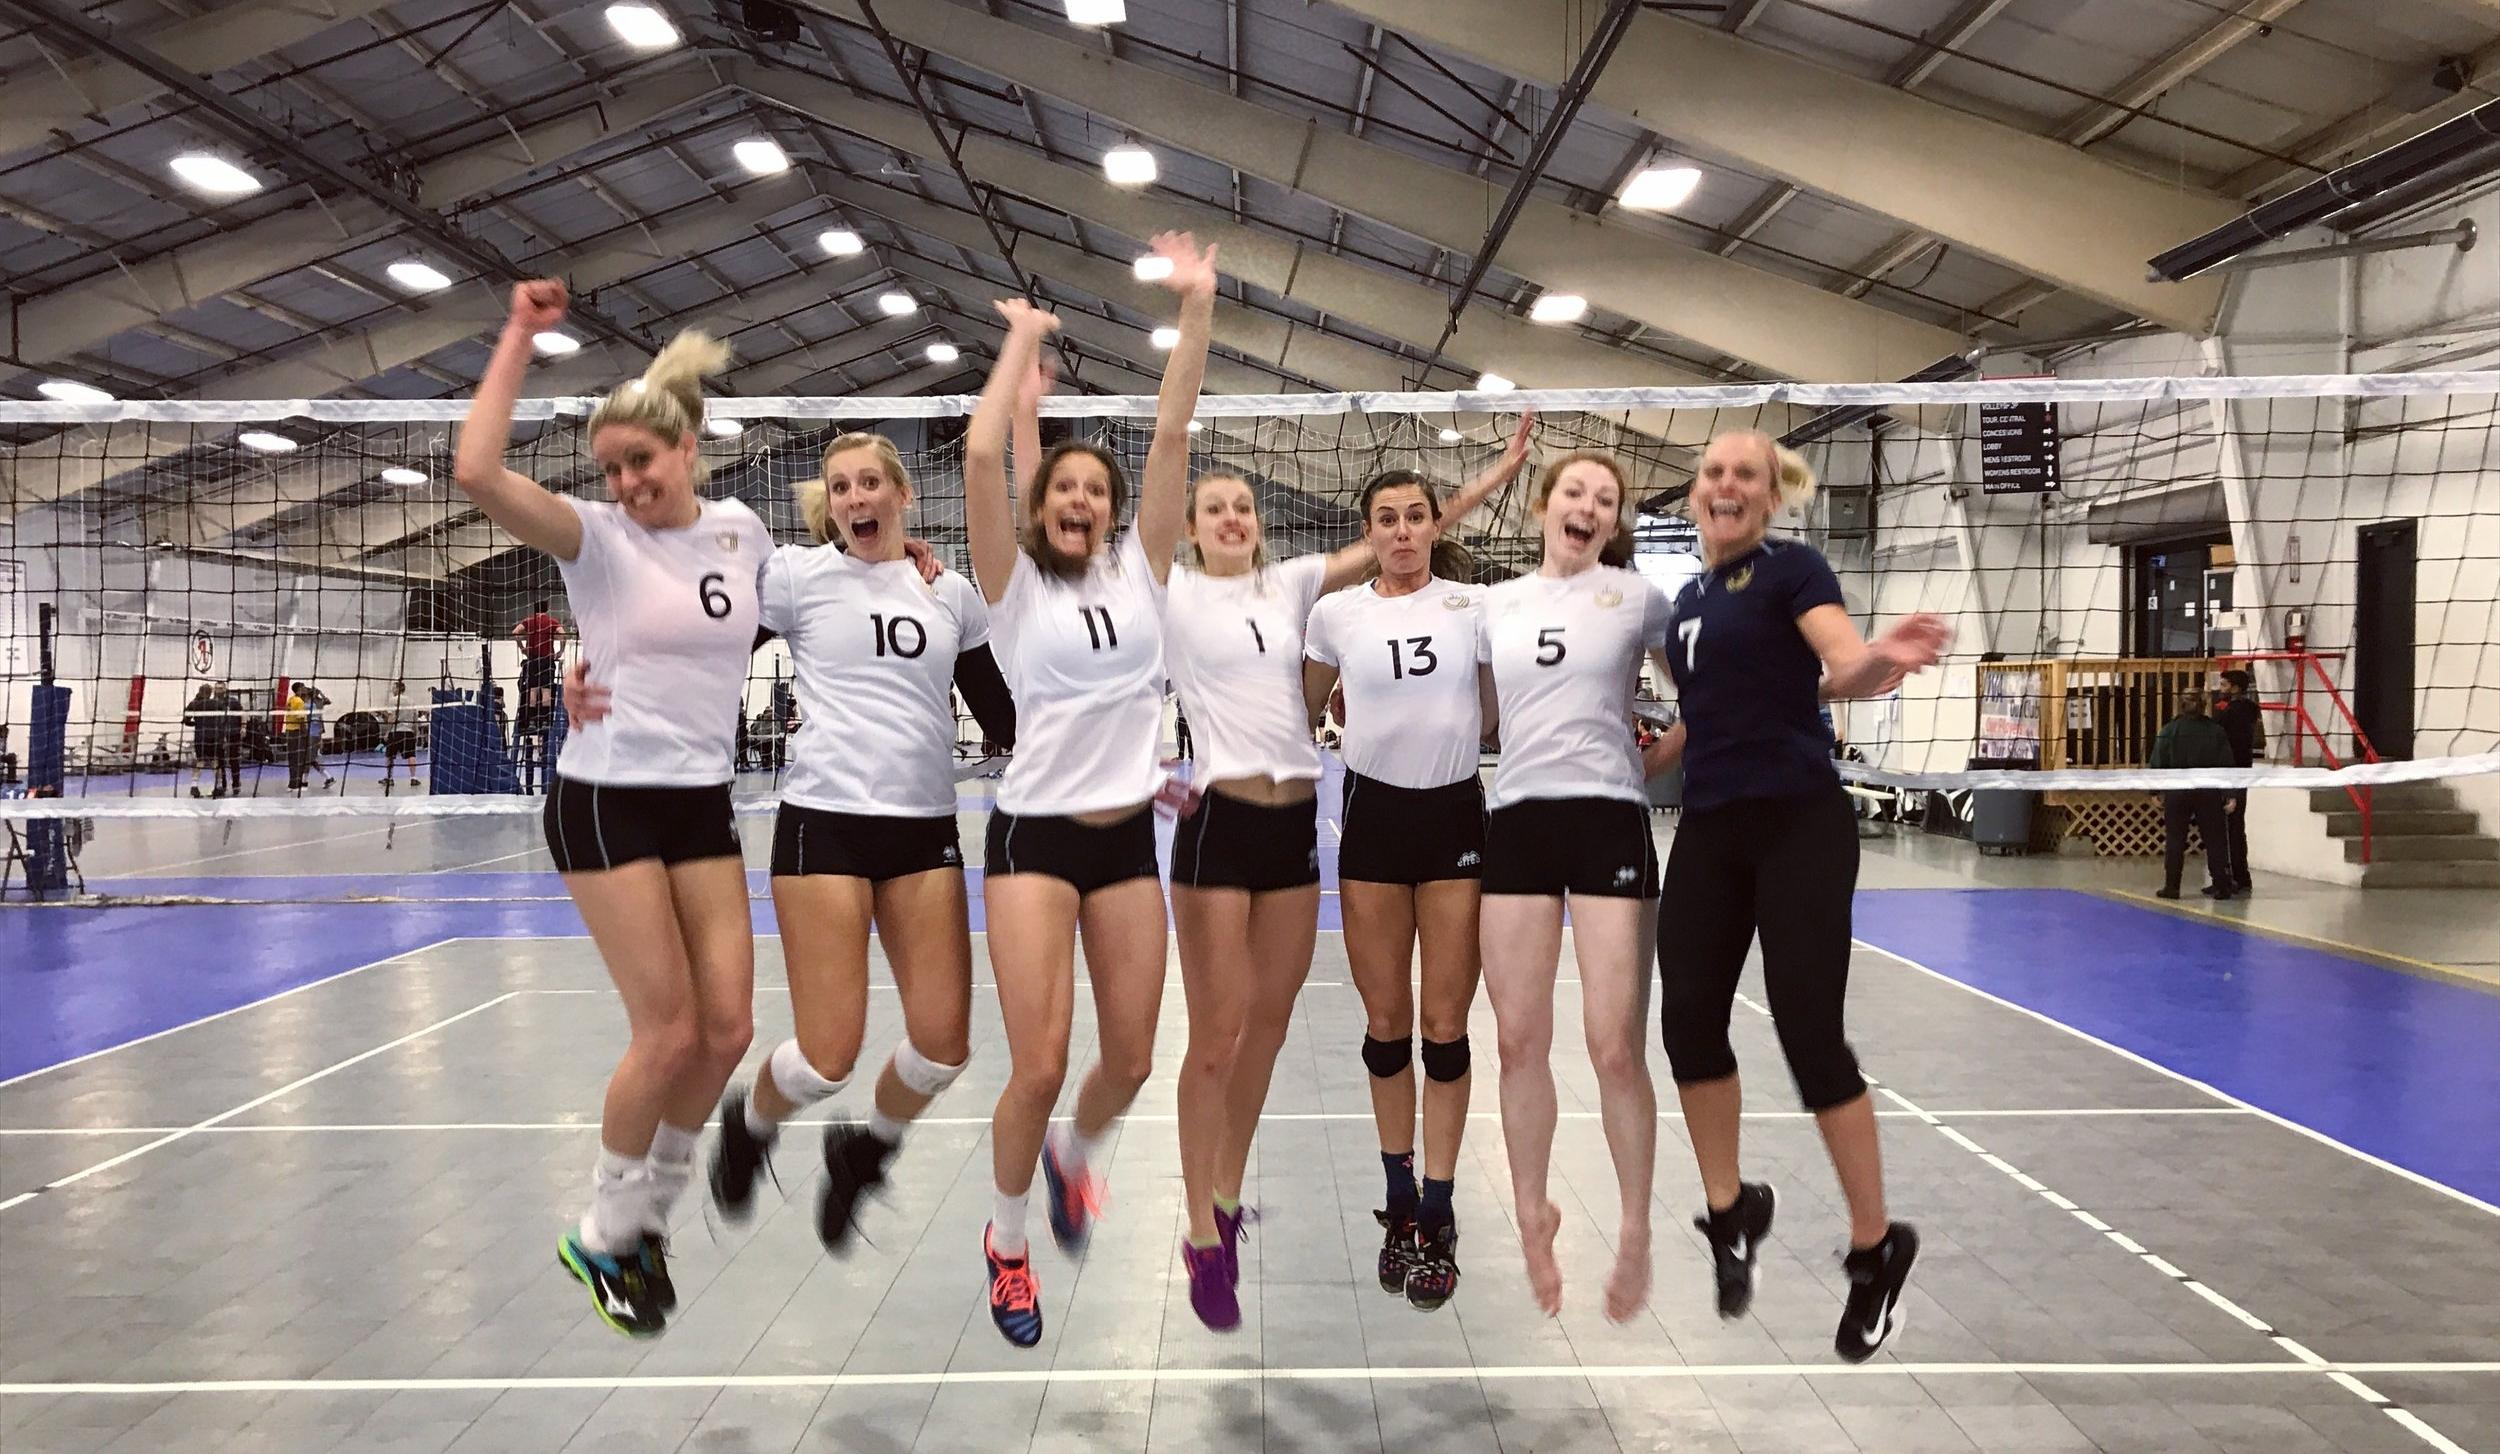 Unity Reign representing Errea across North America - Unity Reign wins GOLD at tournament in Michigan, USA.